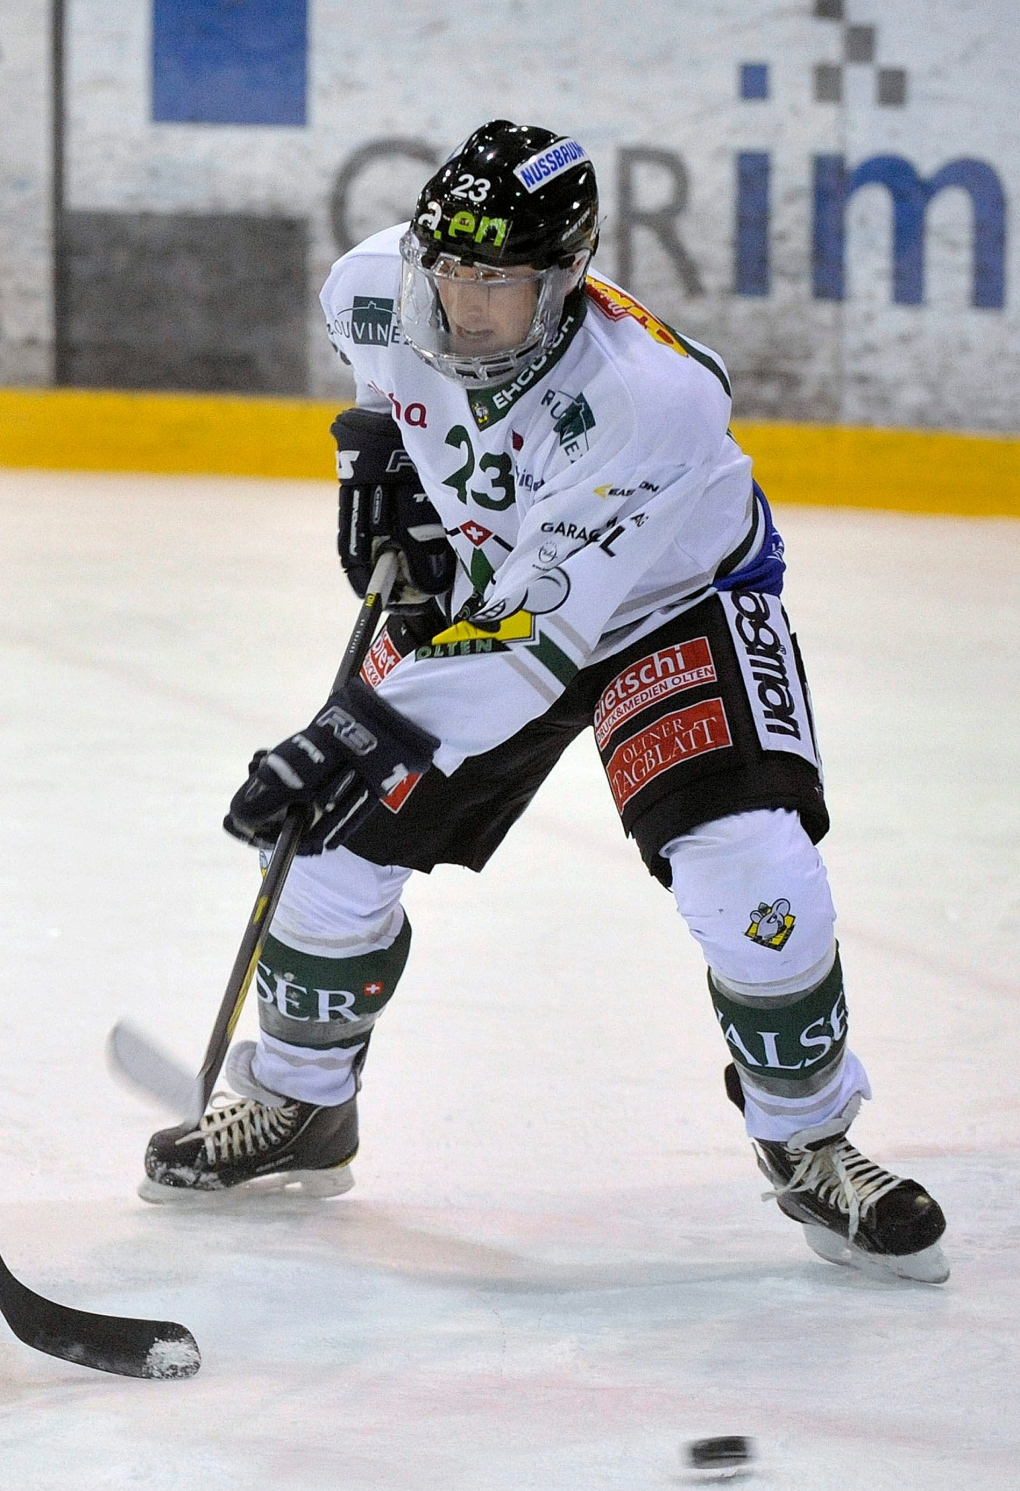 omens hockey played - HD1070×1200